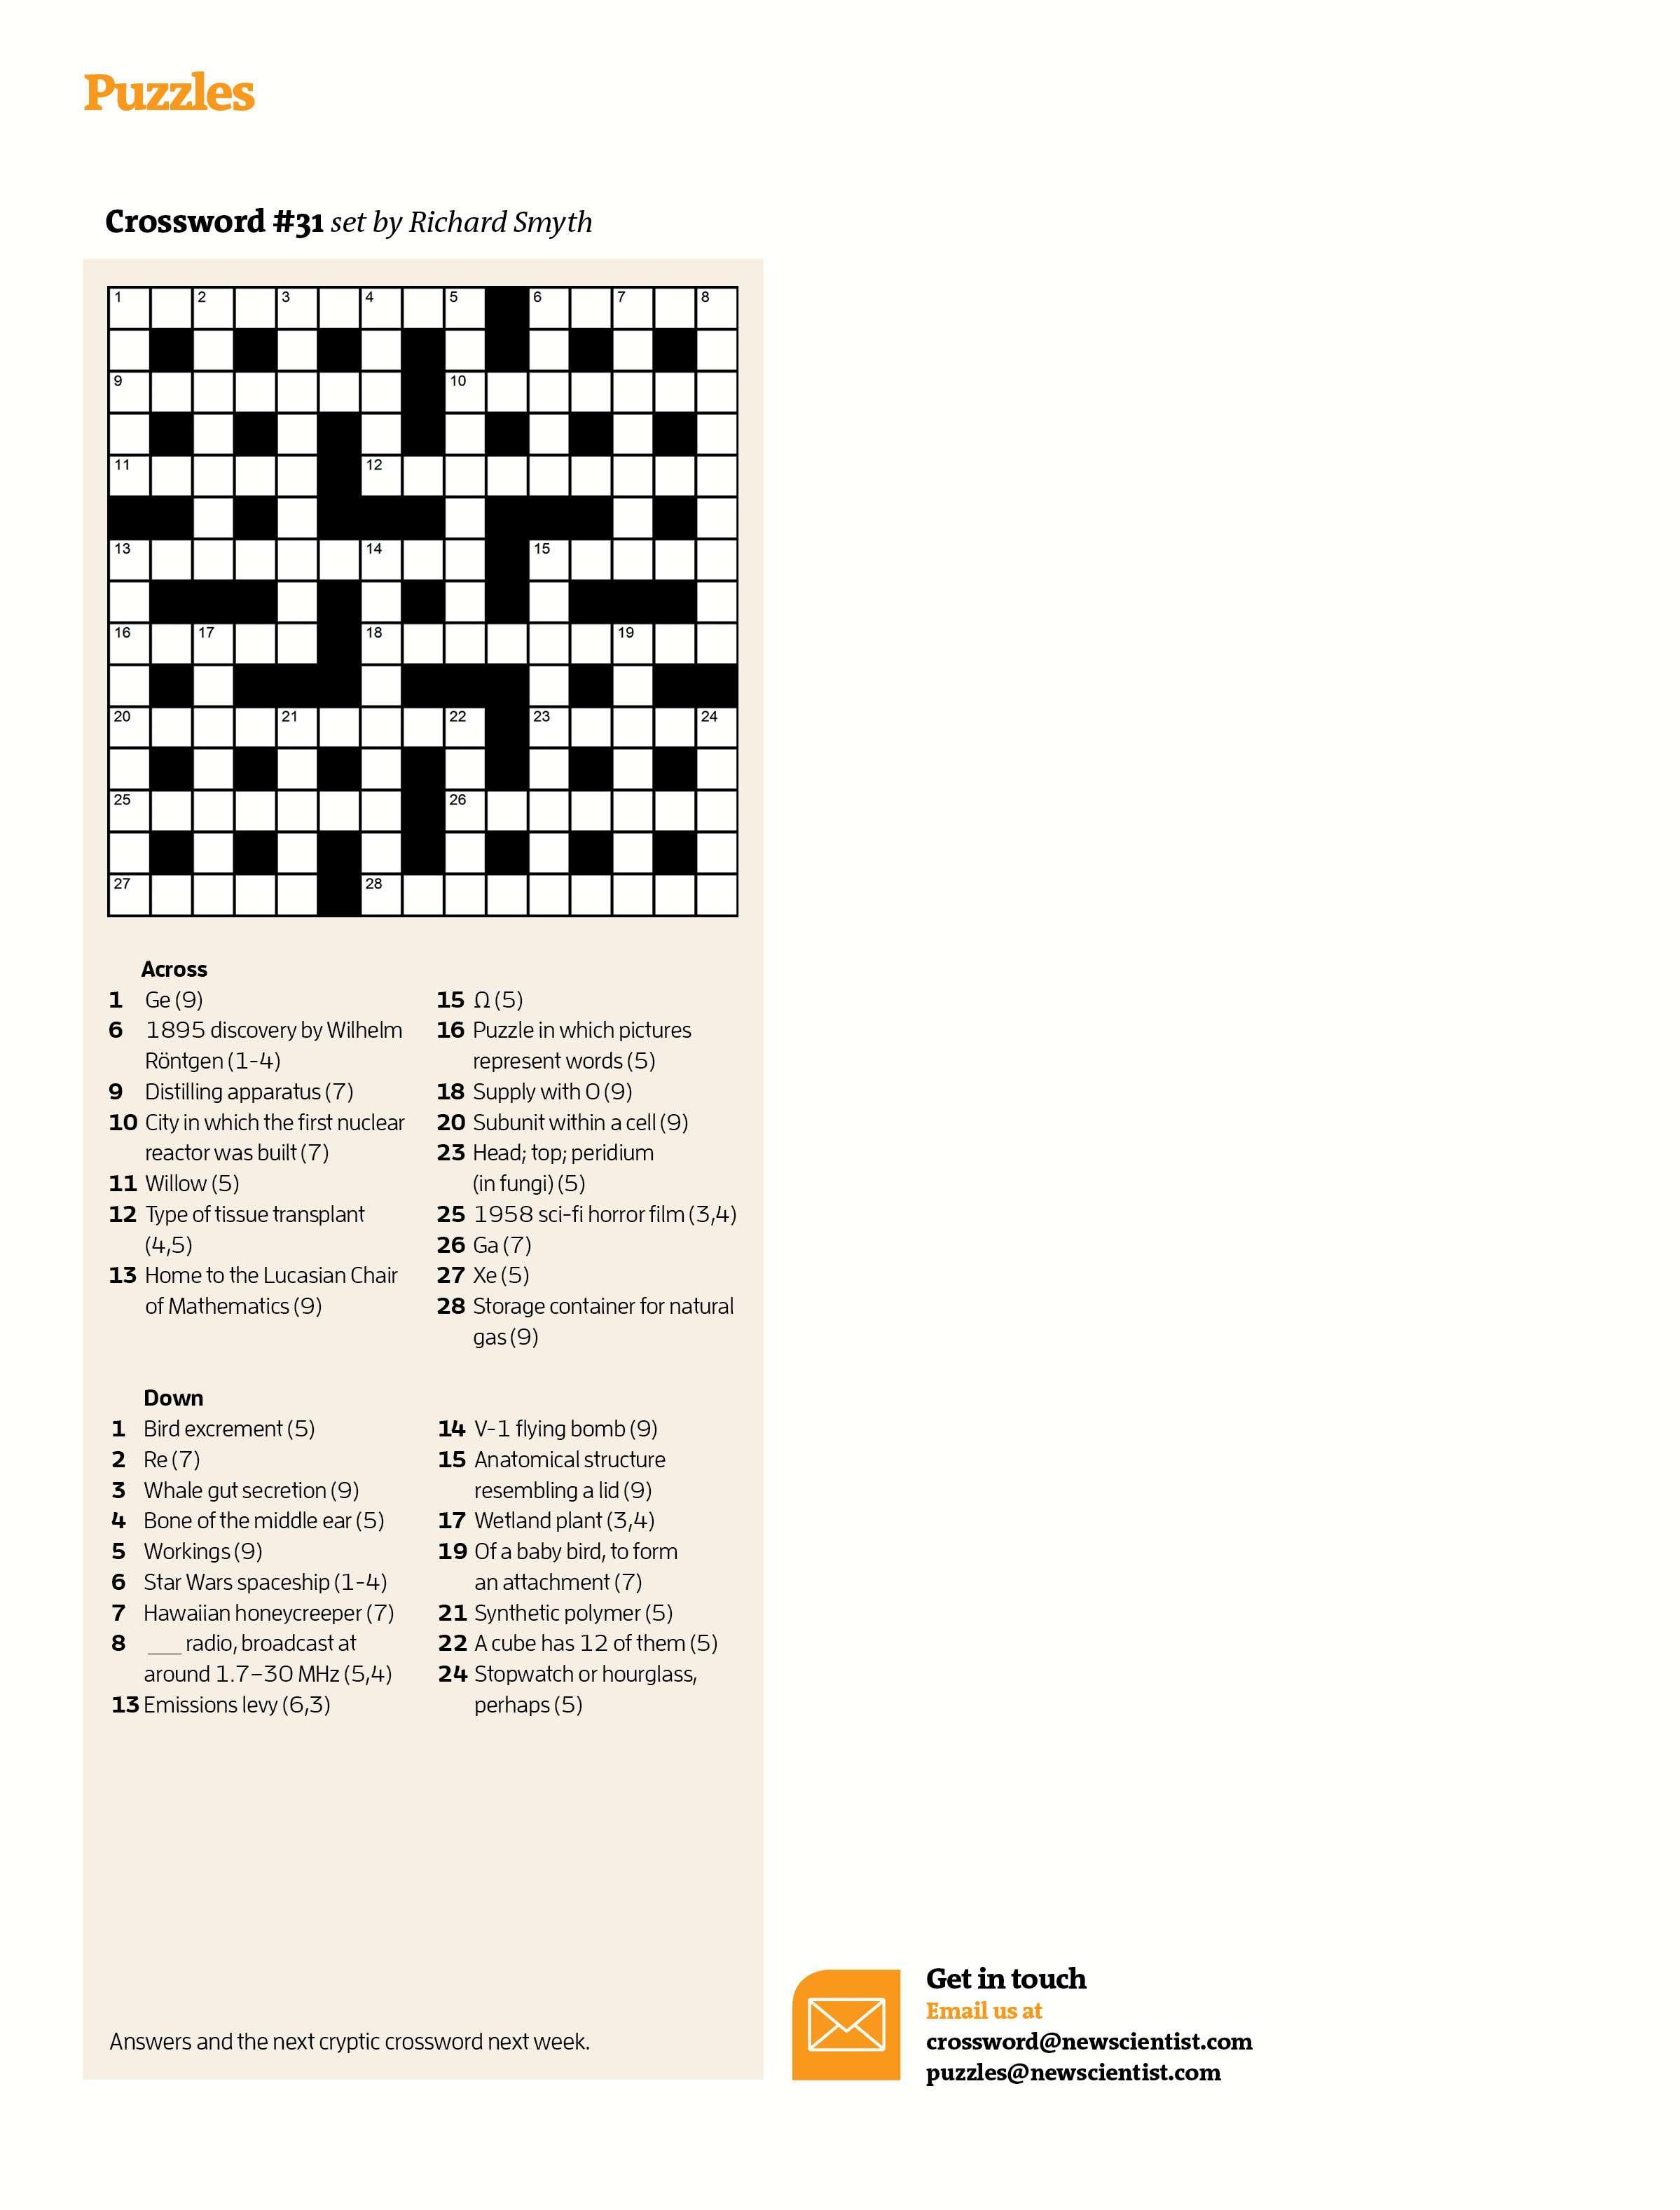 Crossword #31   New Scientist - Daily Quick Crossword Printable Version